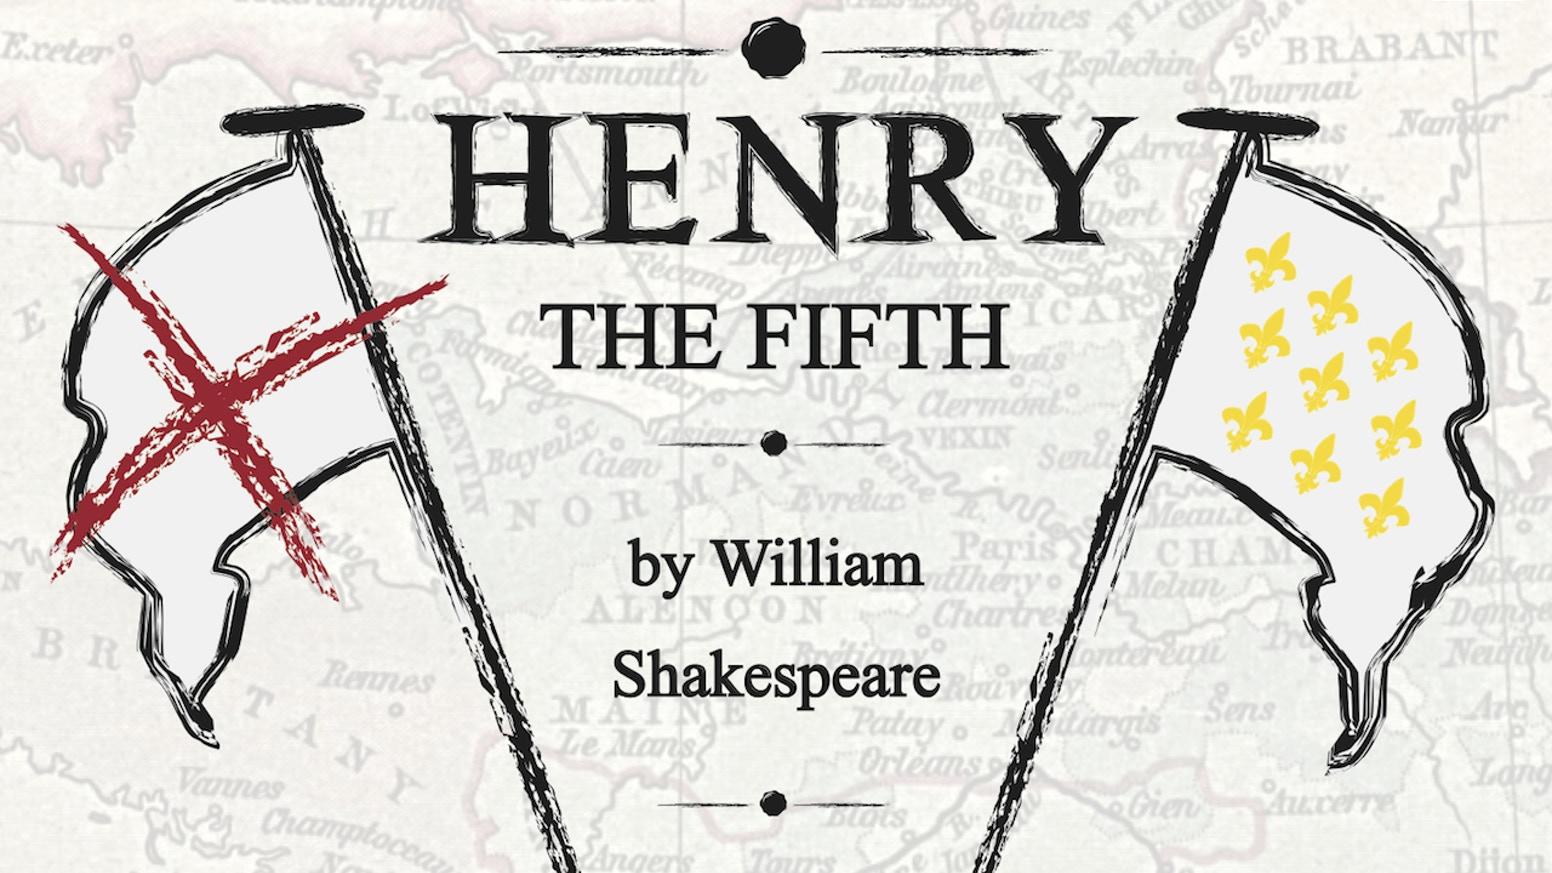 Enrico V di Shakespeare